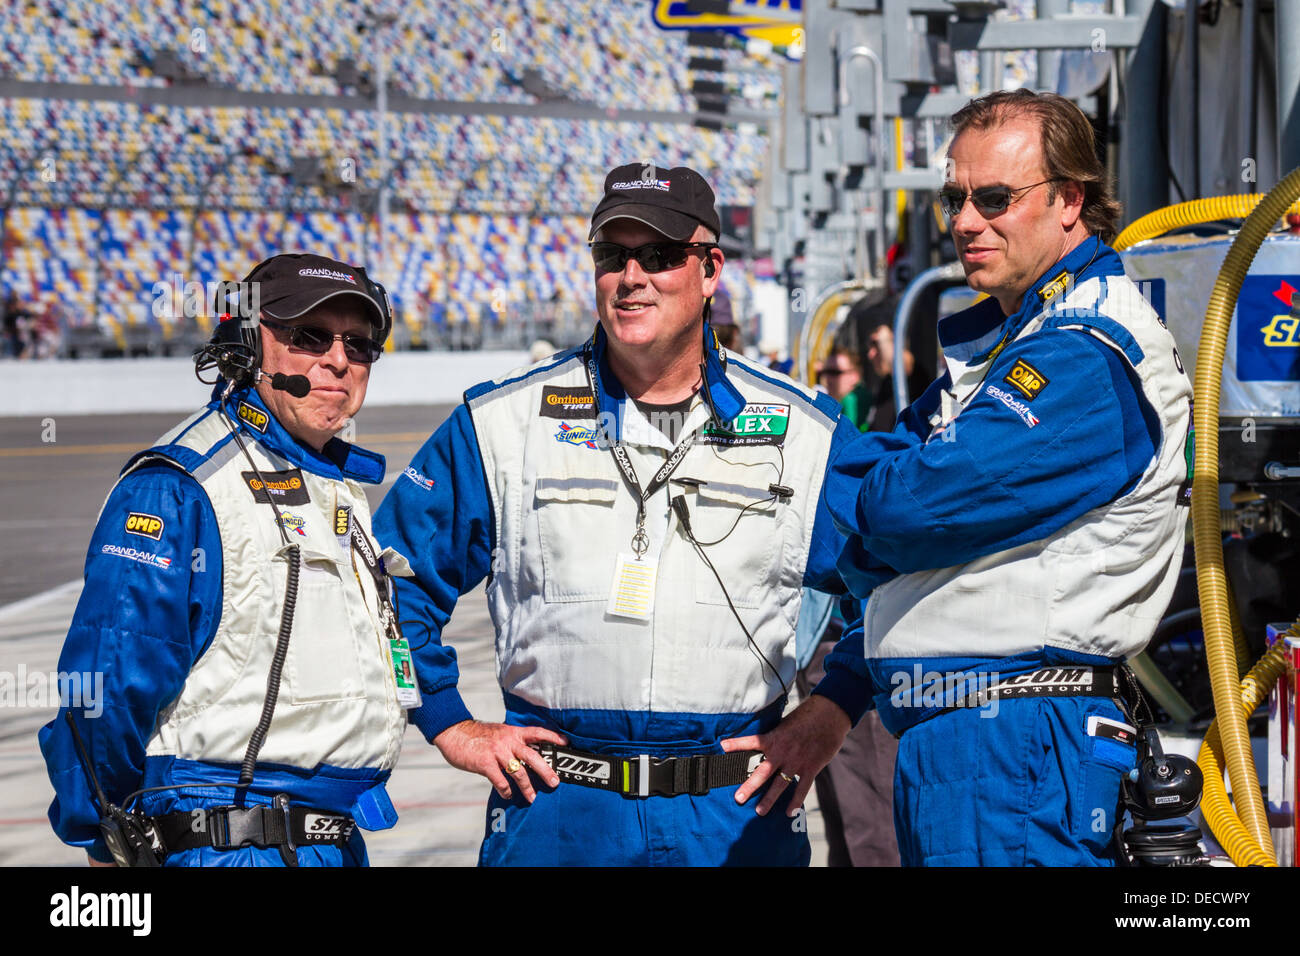 Grand Am officials pit row road track communication Daytona International Speedway race racing Rolex 'Rolex 24' 2012 Florida FL - Stock Image